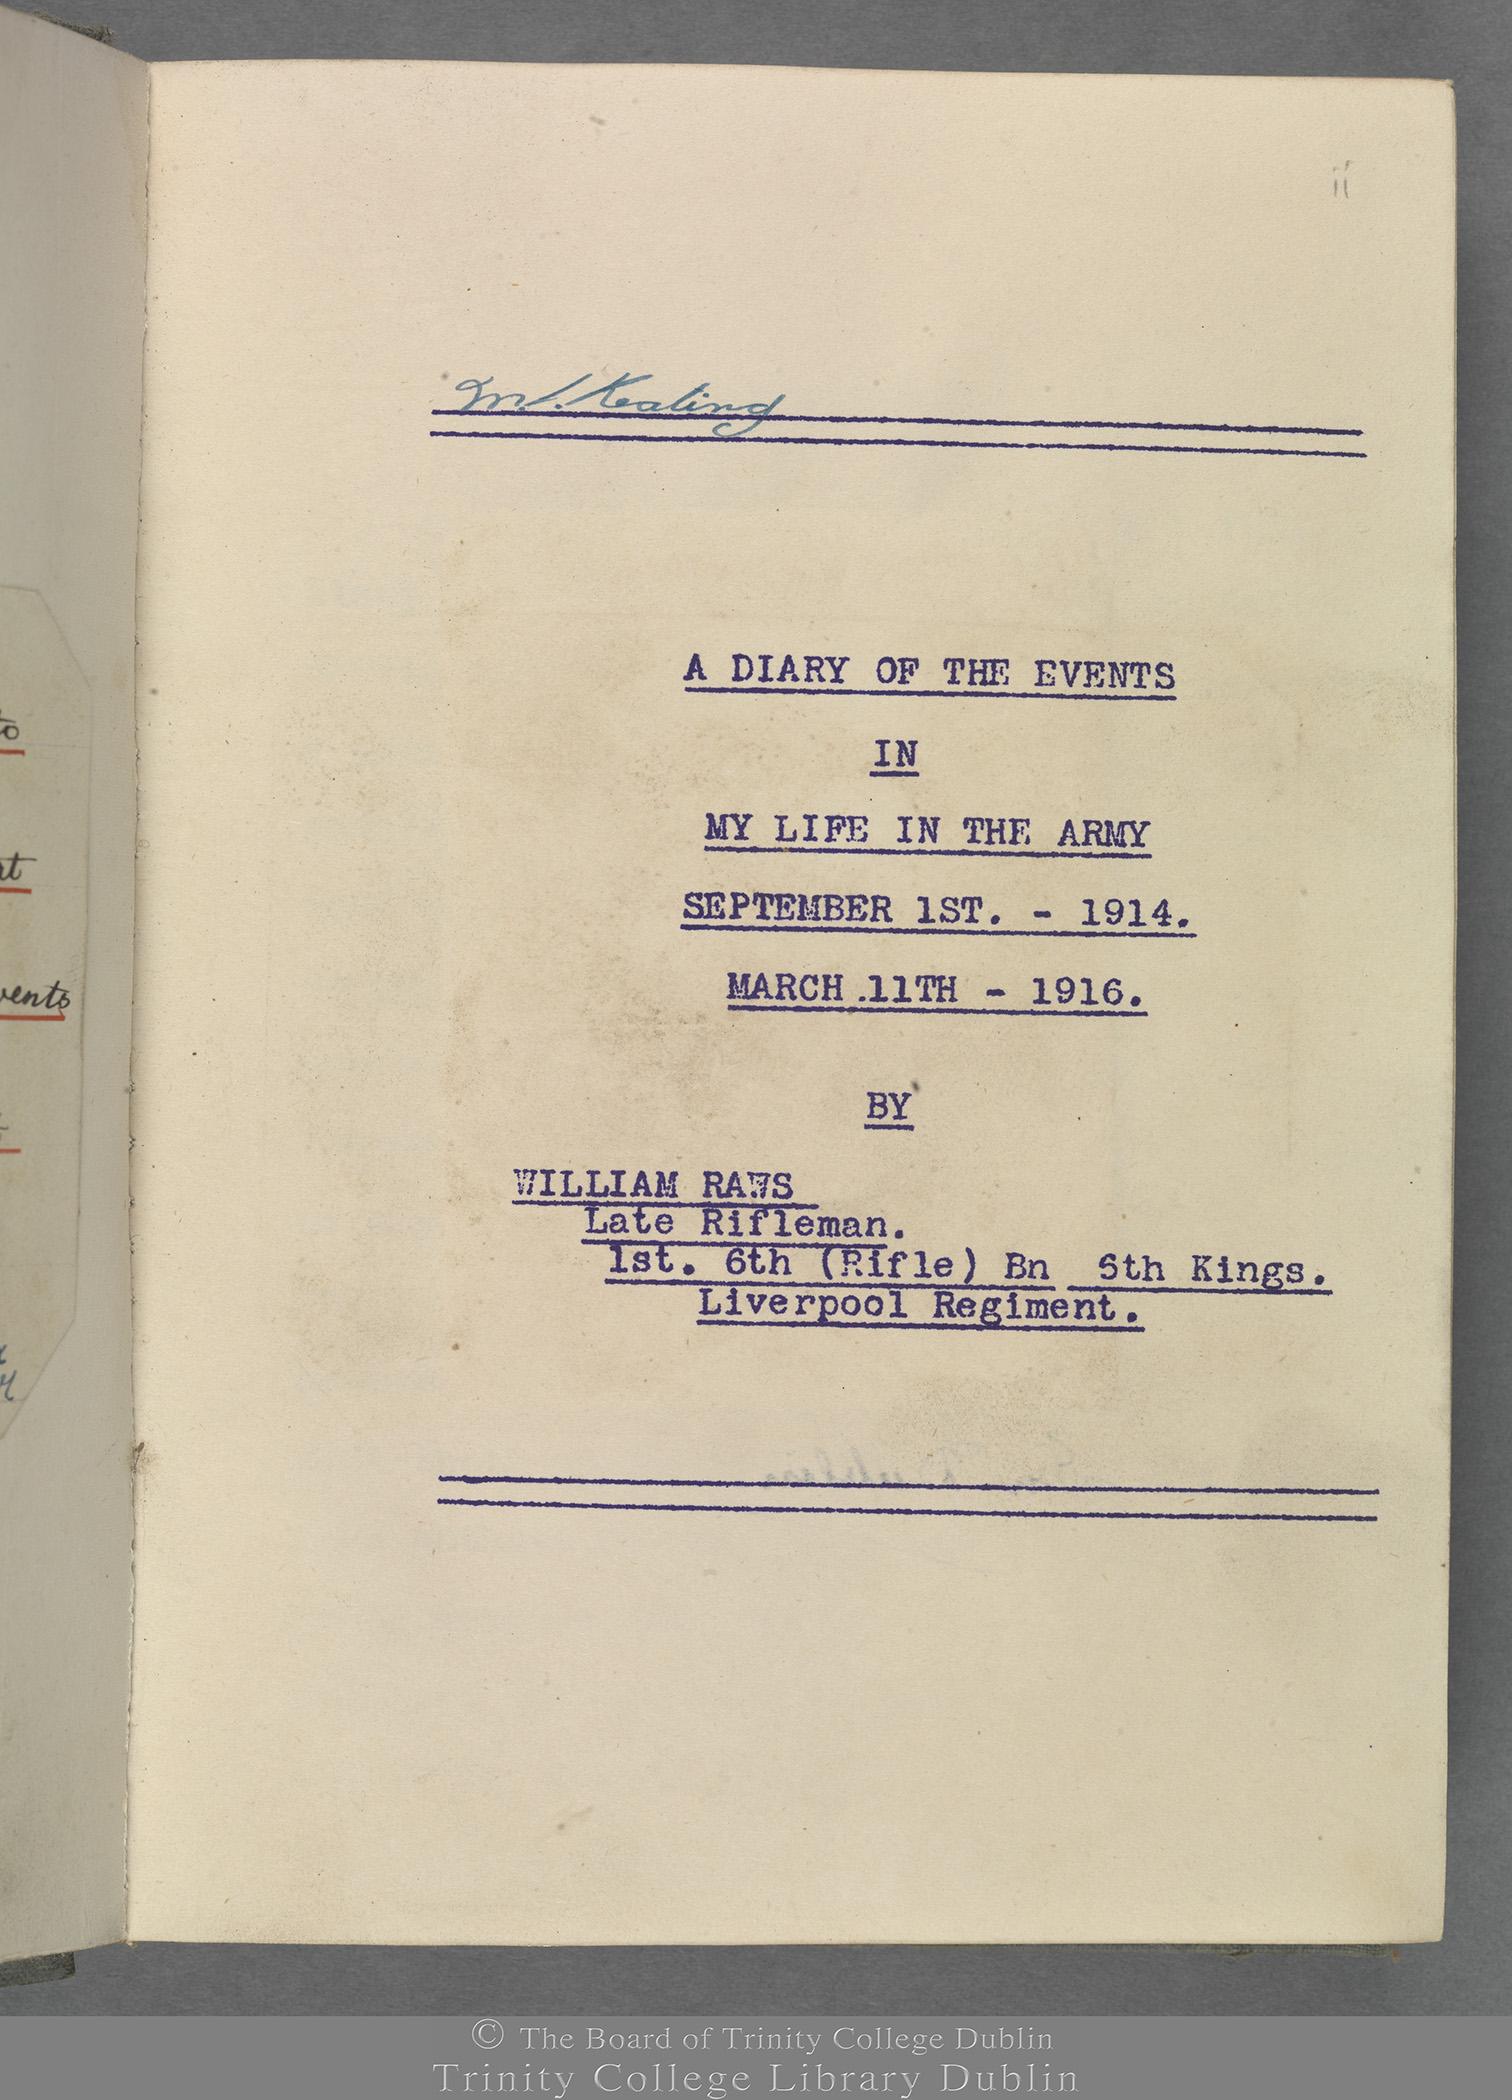 TCD MS 10853 folio ii recto